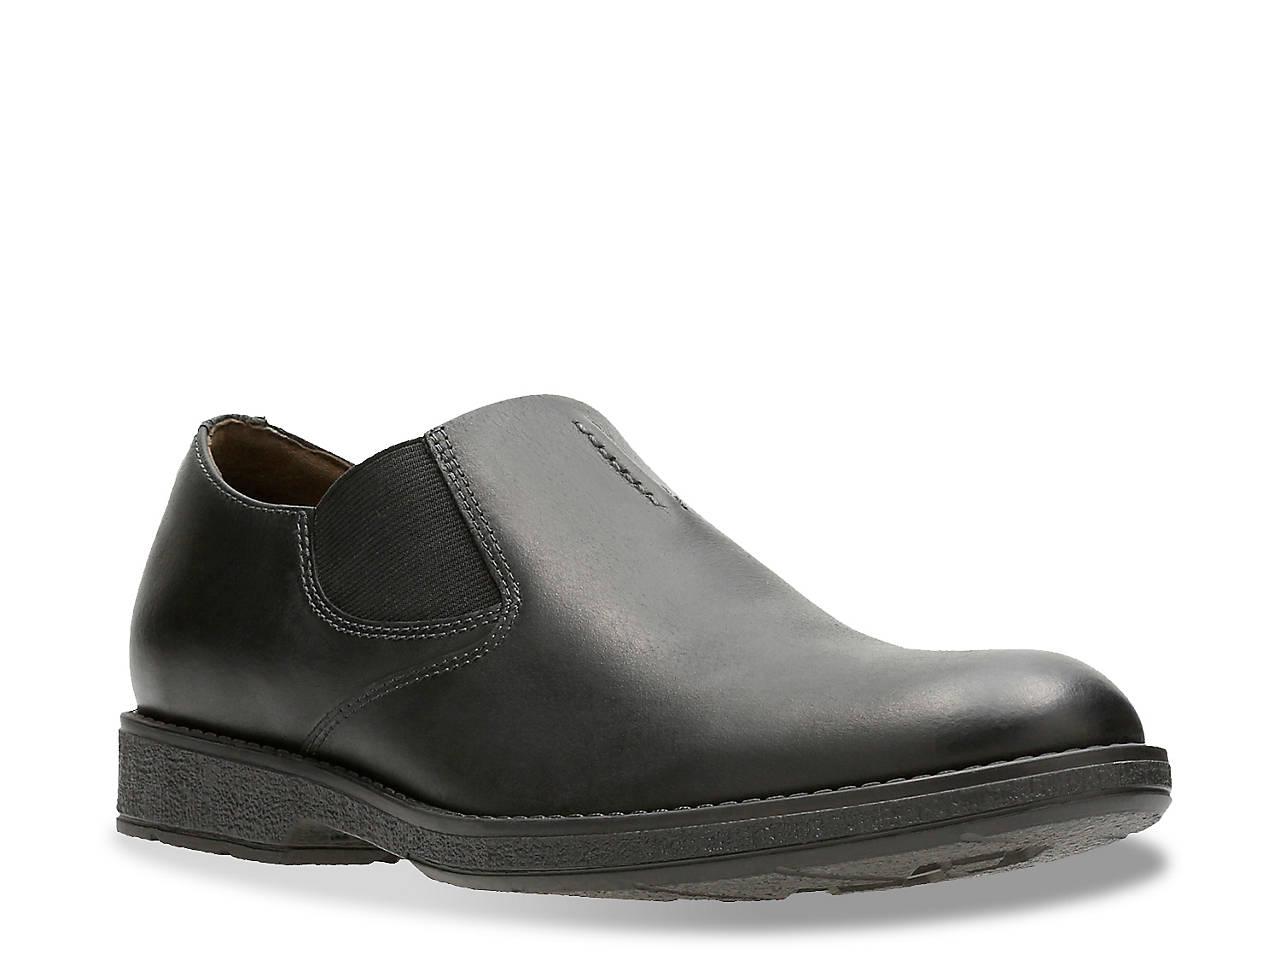 c019c61e72323 Clarks Hinman Step Slip-On Men's Shoes | DSW